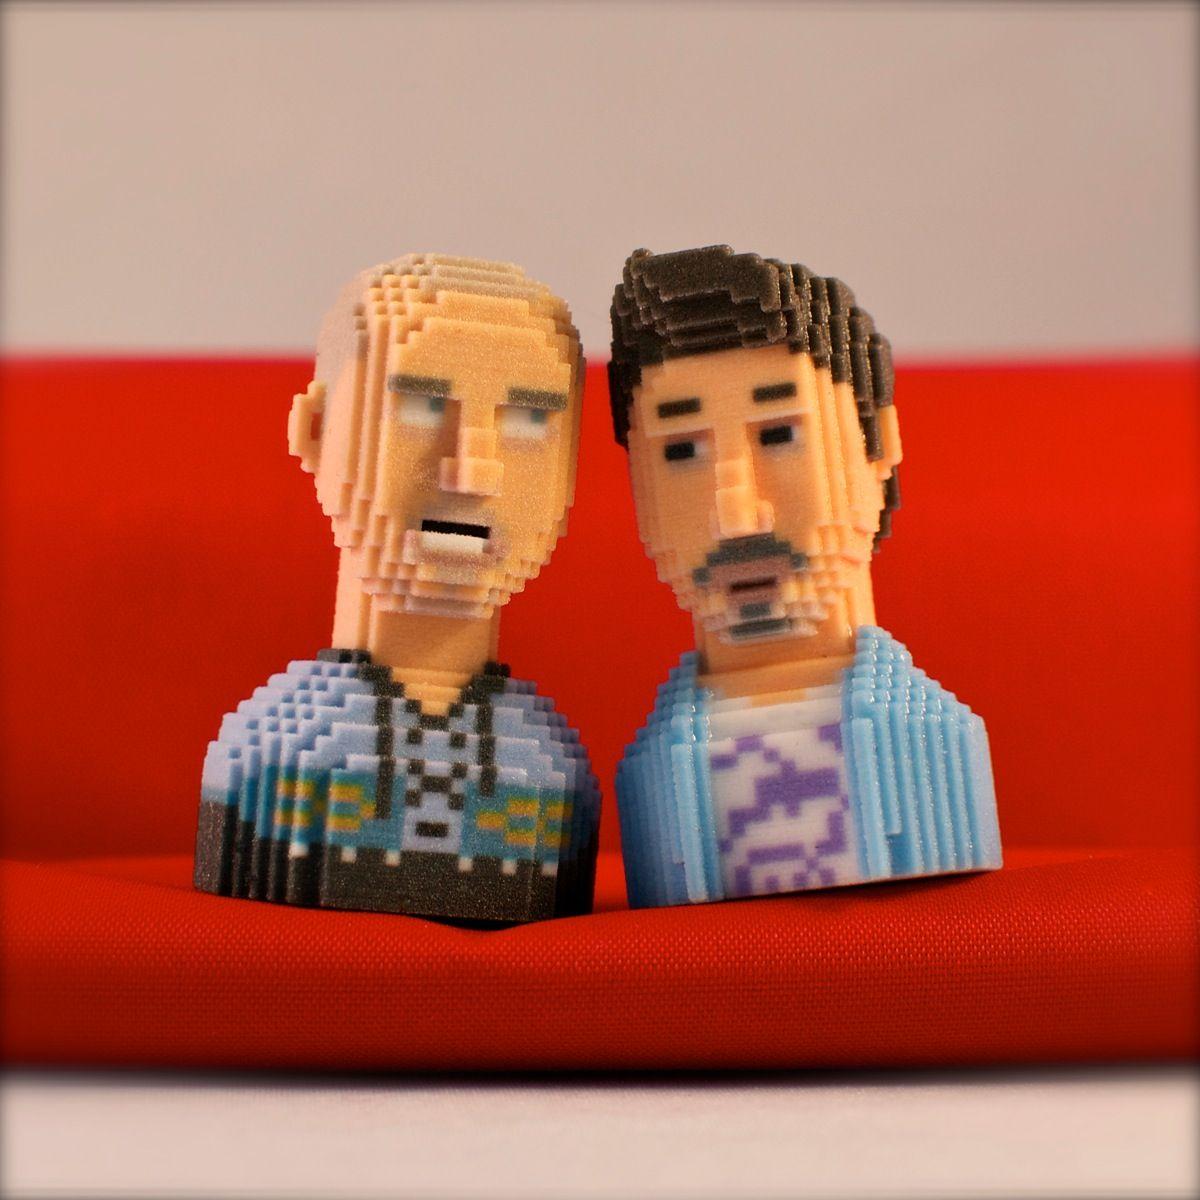 3dprinting Sculpture Artist: NERDZ Revival !!! #leblox #pixelart # 3Dprinting #tribute